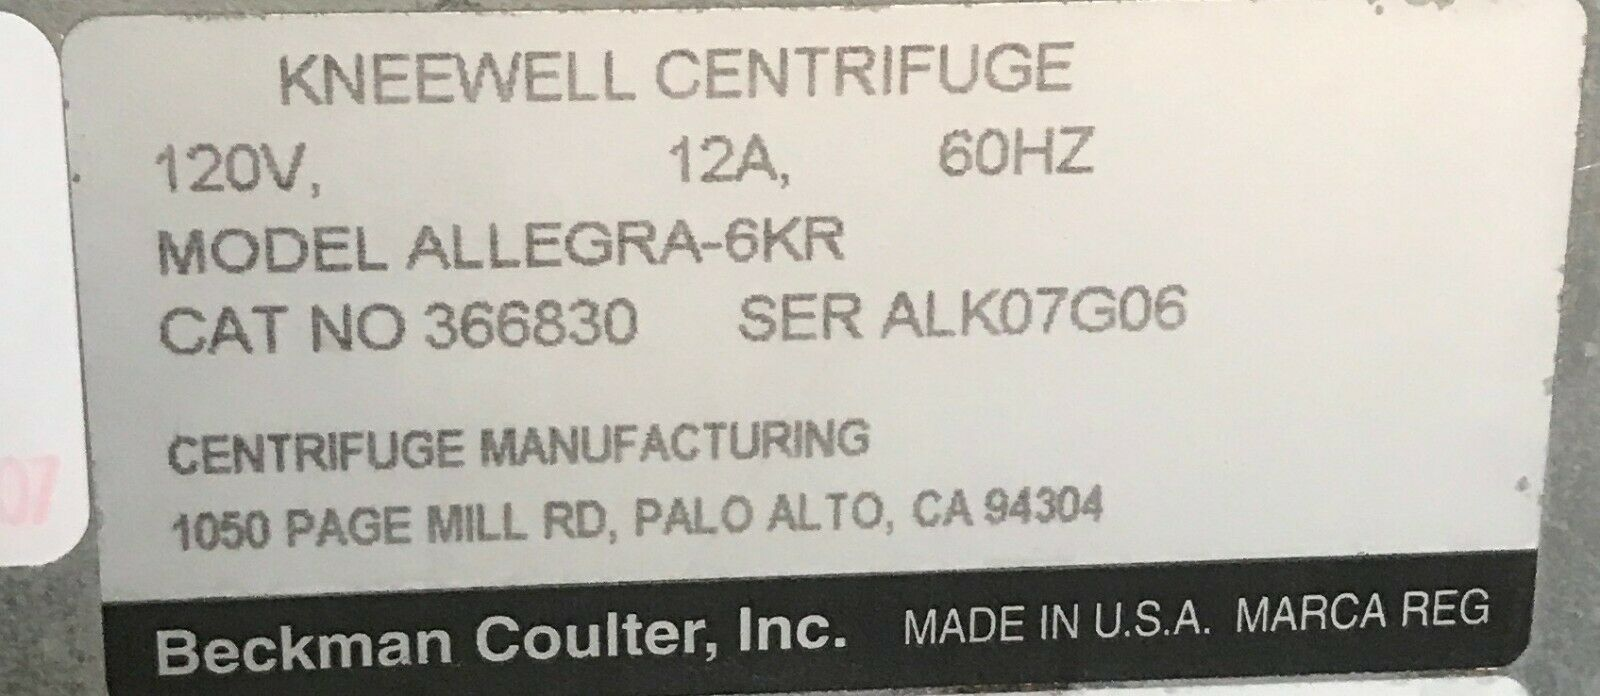 Beckman Coulter Allegra 6KR Centrifuge